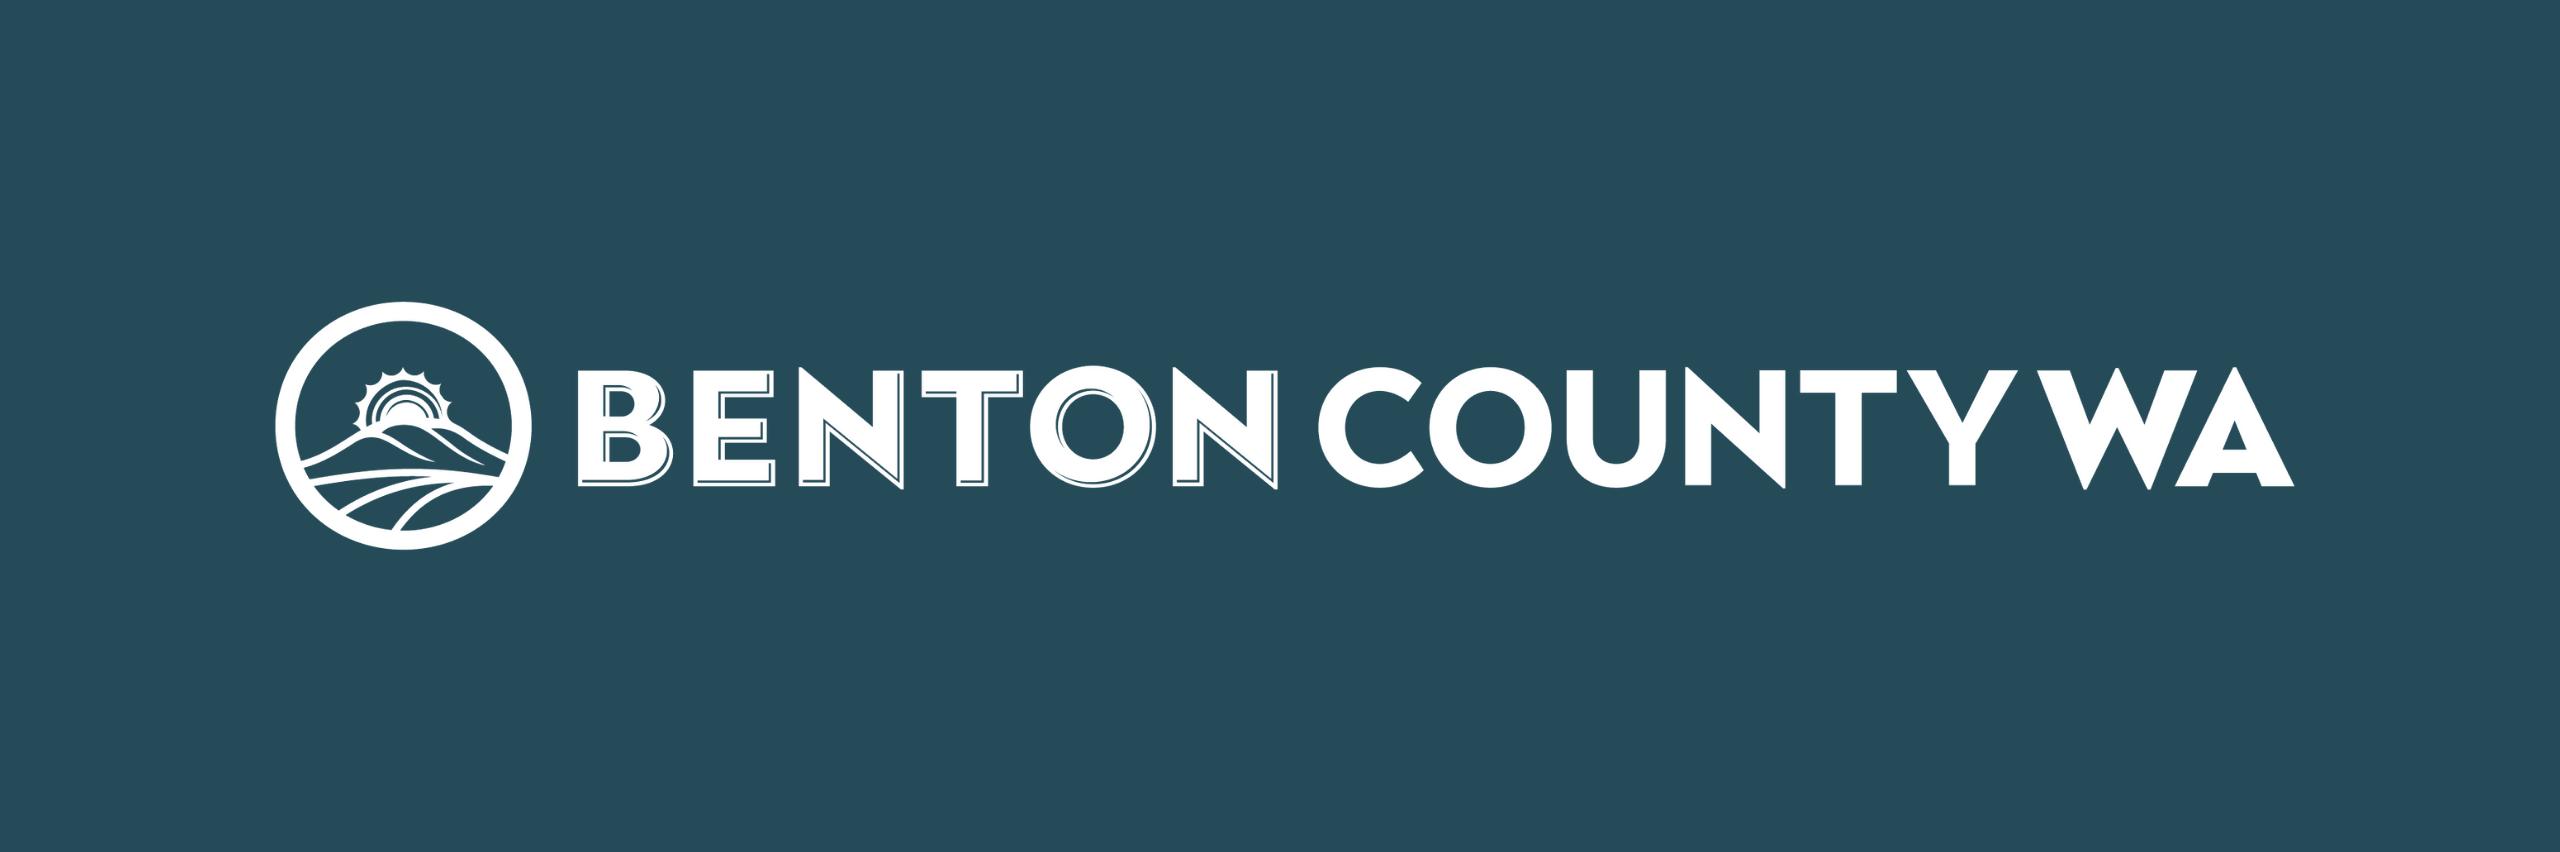 County of Benton WA